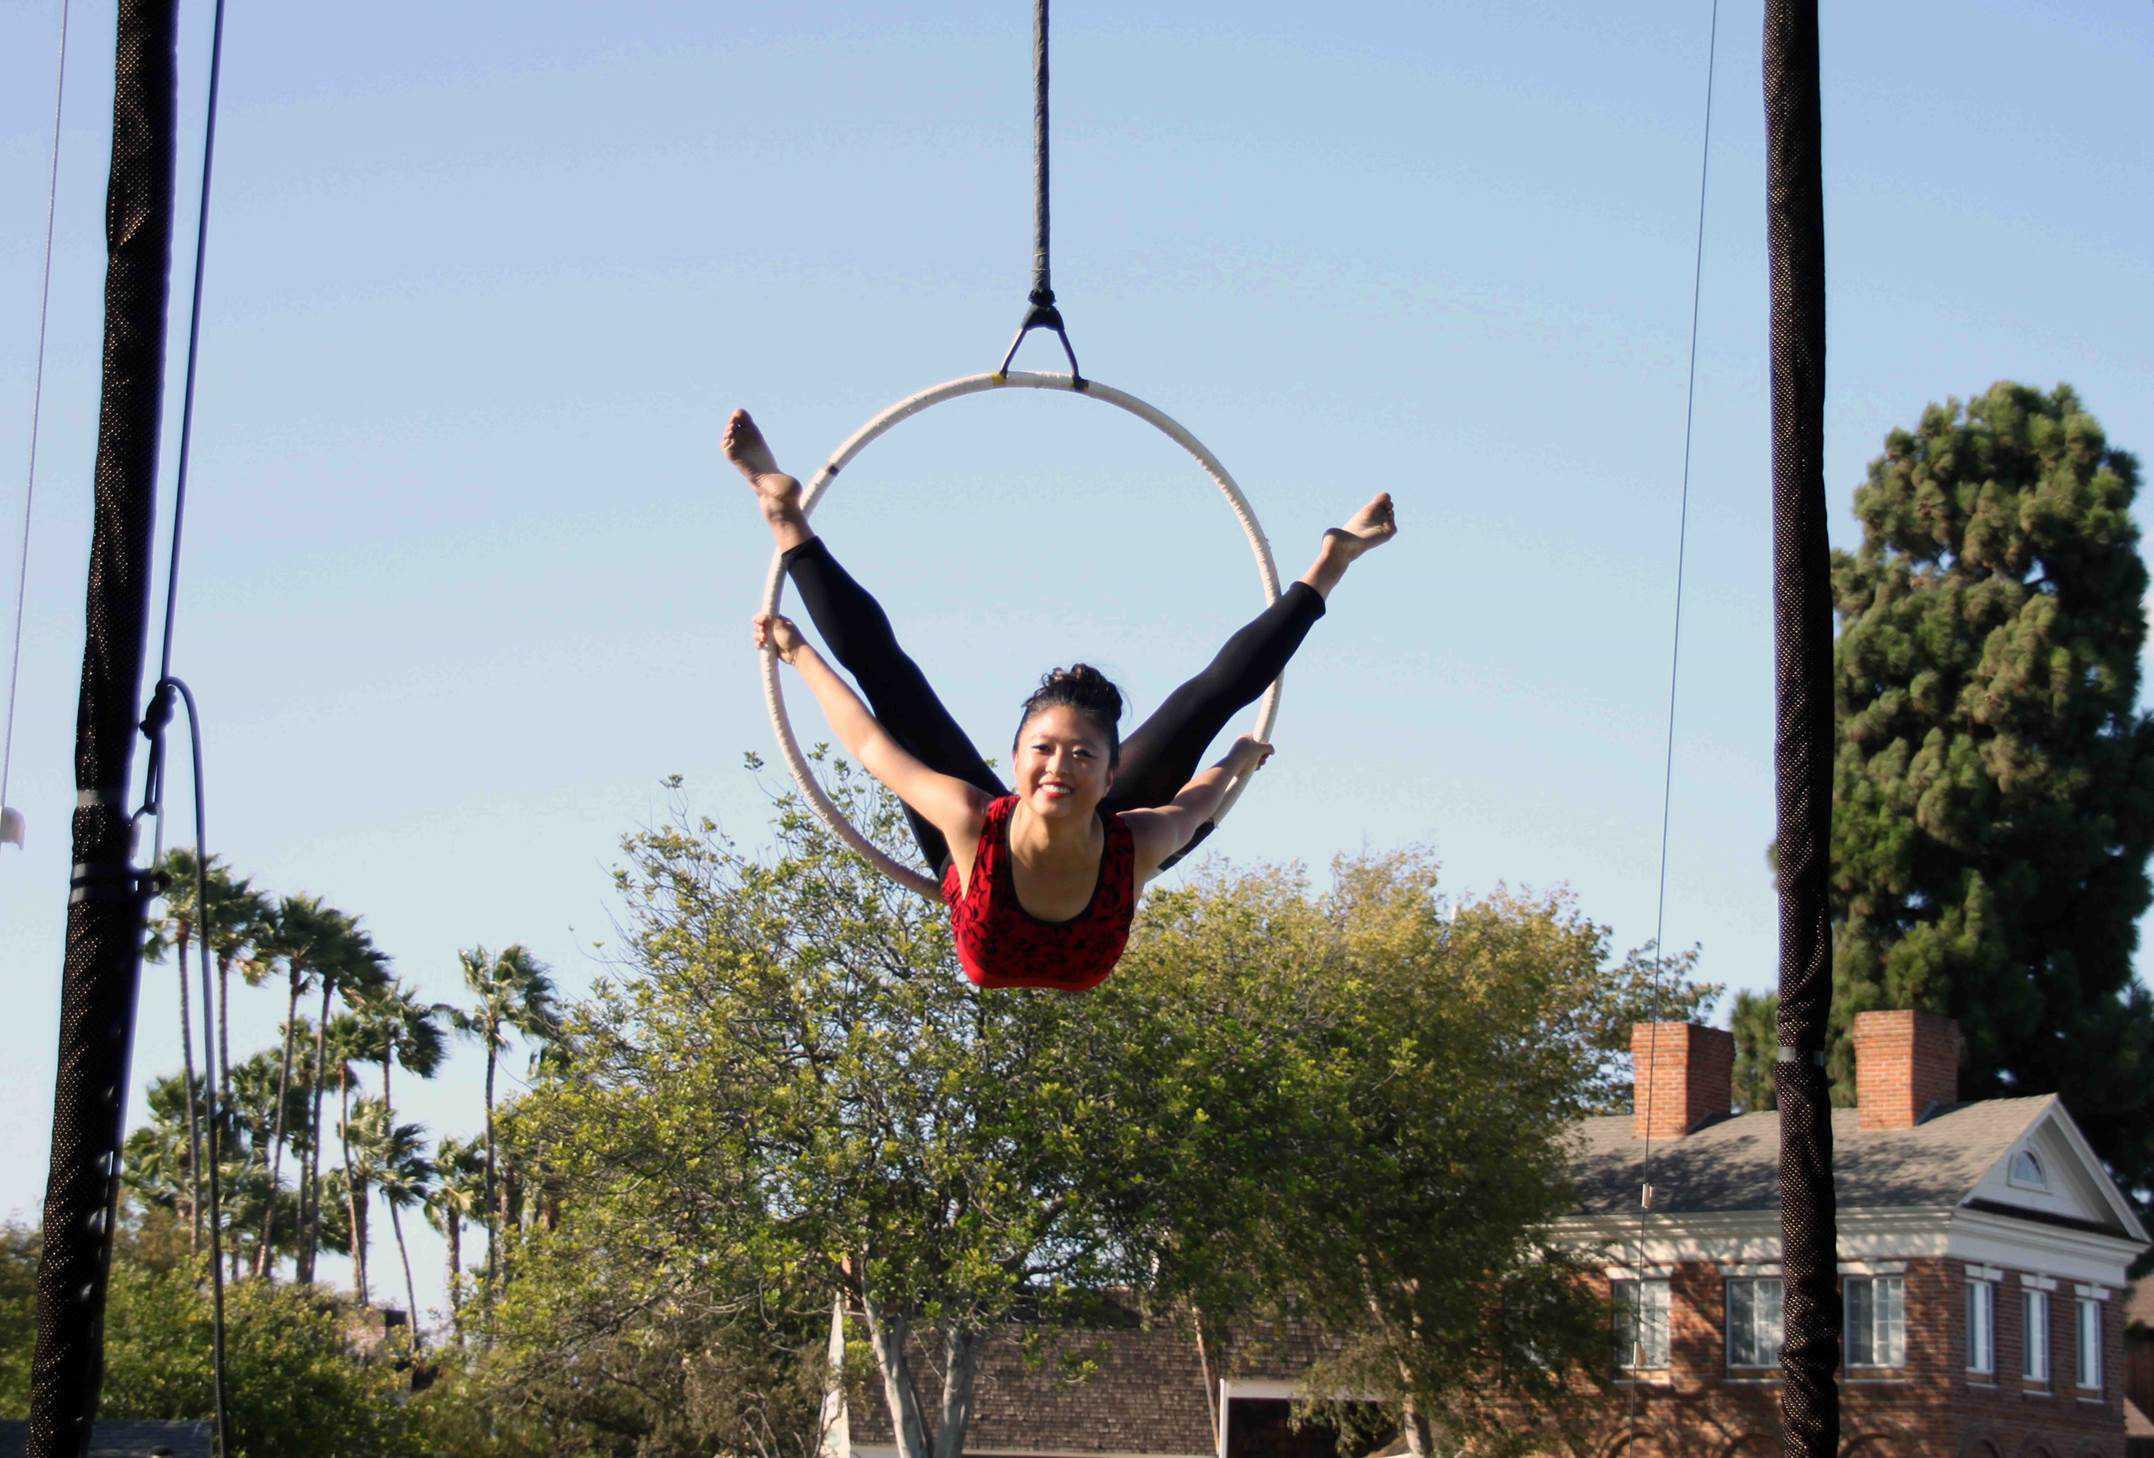 Senior Yoshida hangs above the trees during her performance